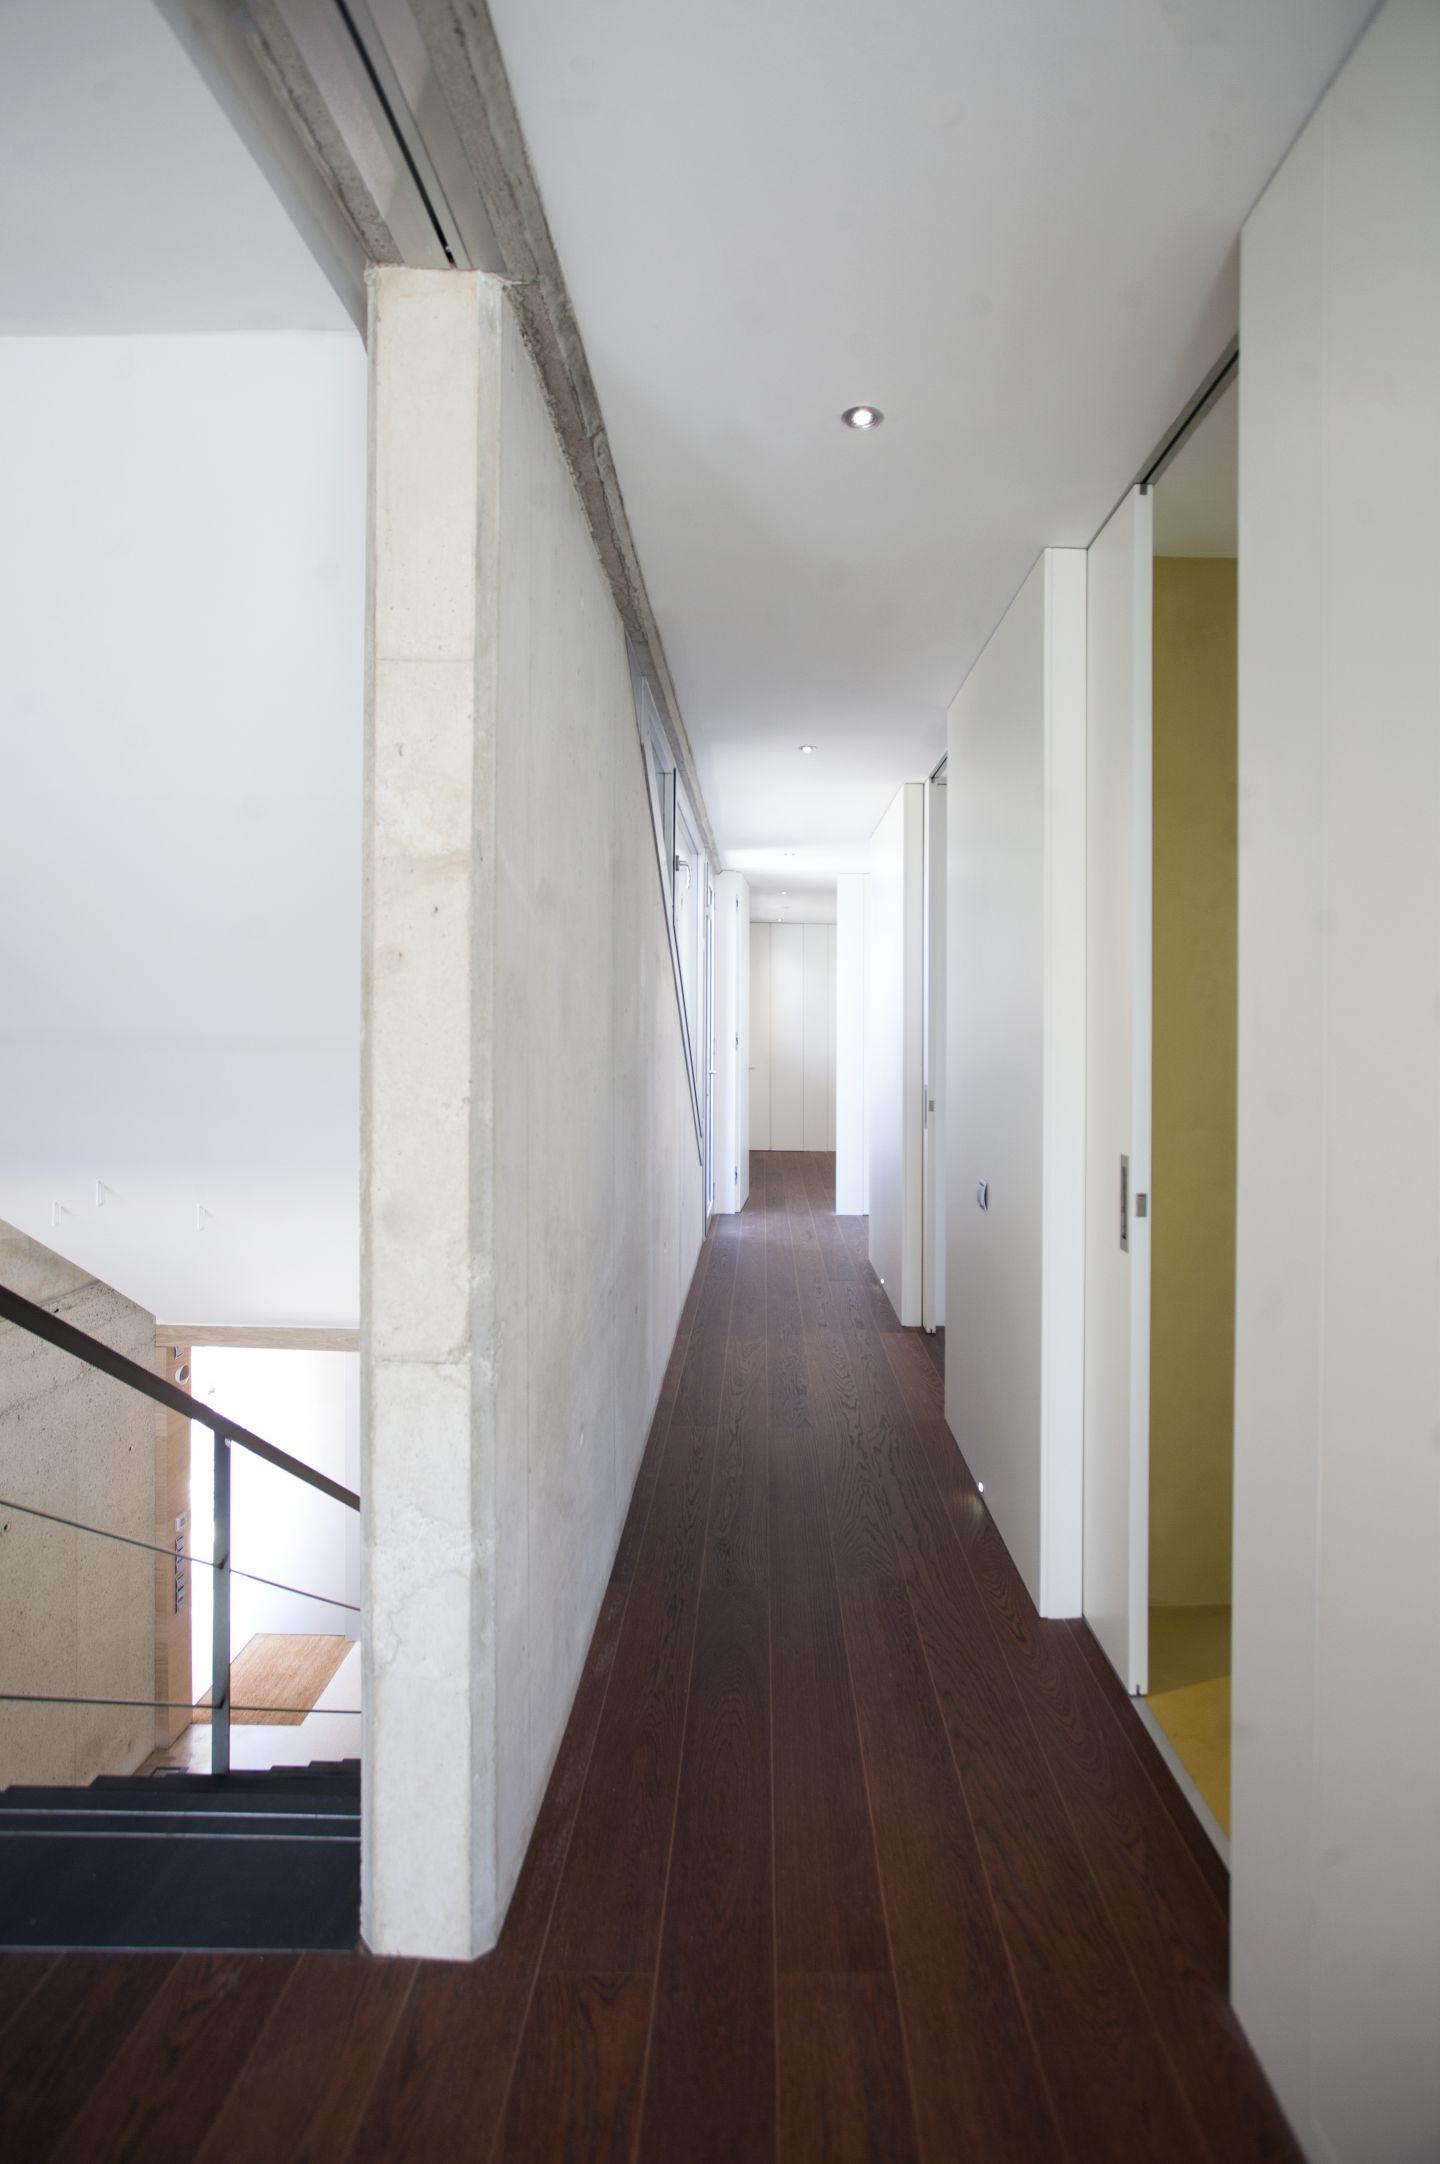 roa-arquitectura-sostenibilidad-residencial unifamiliar-nzeb 13